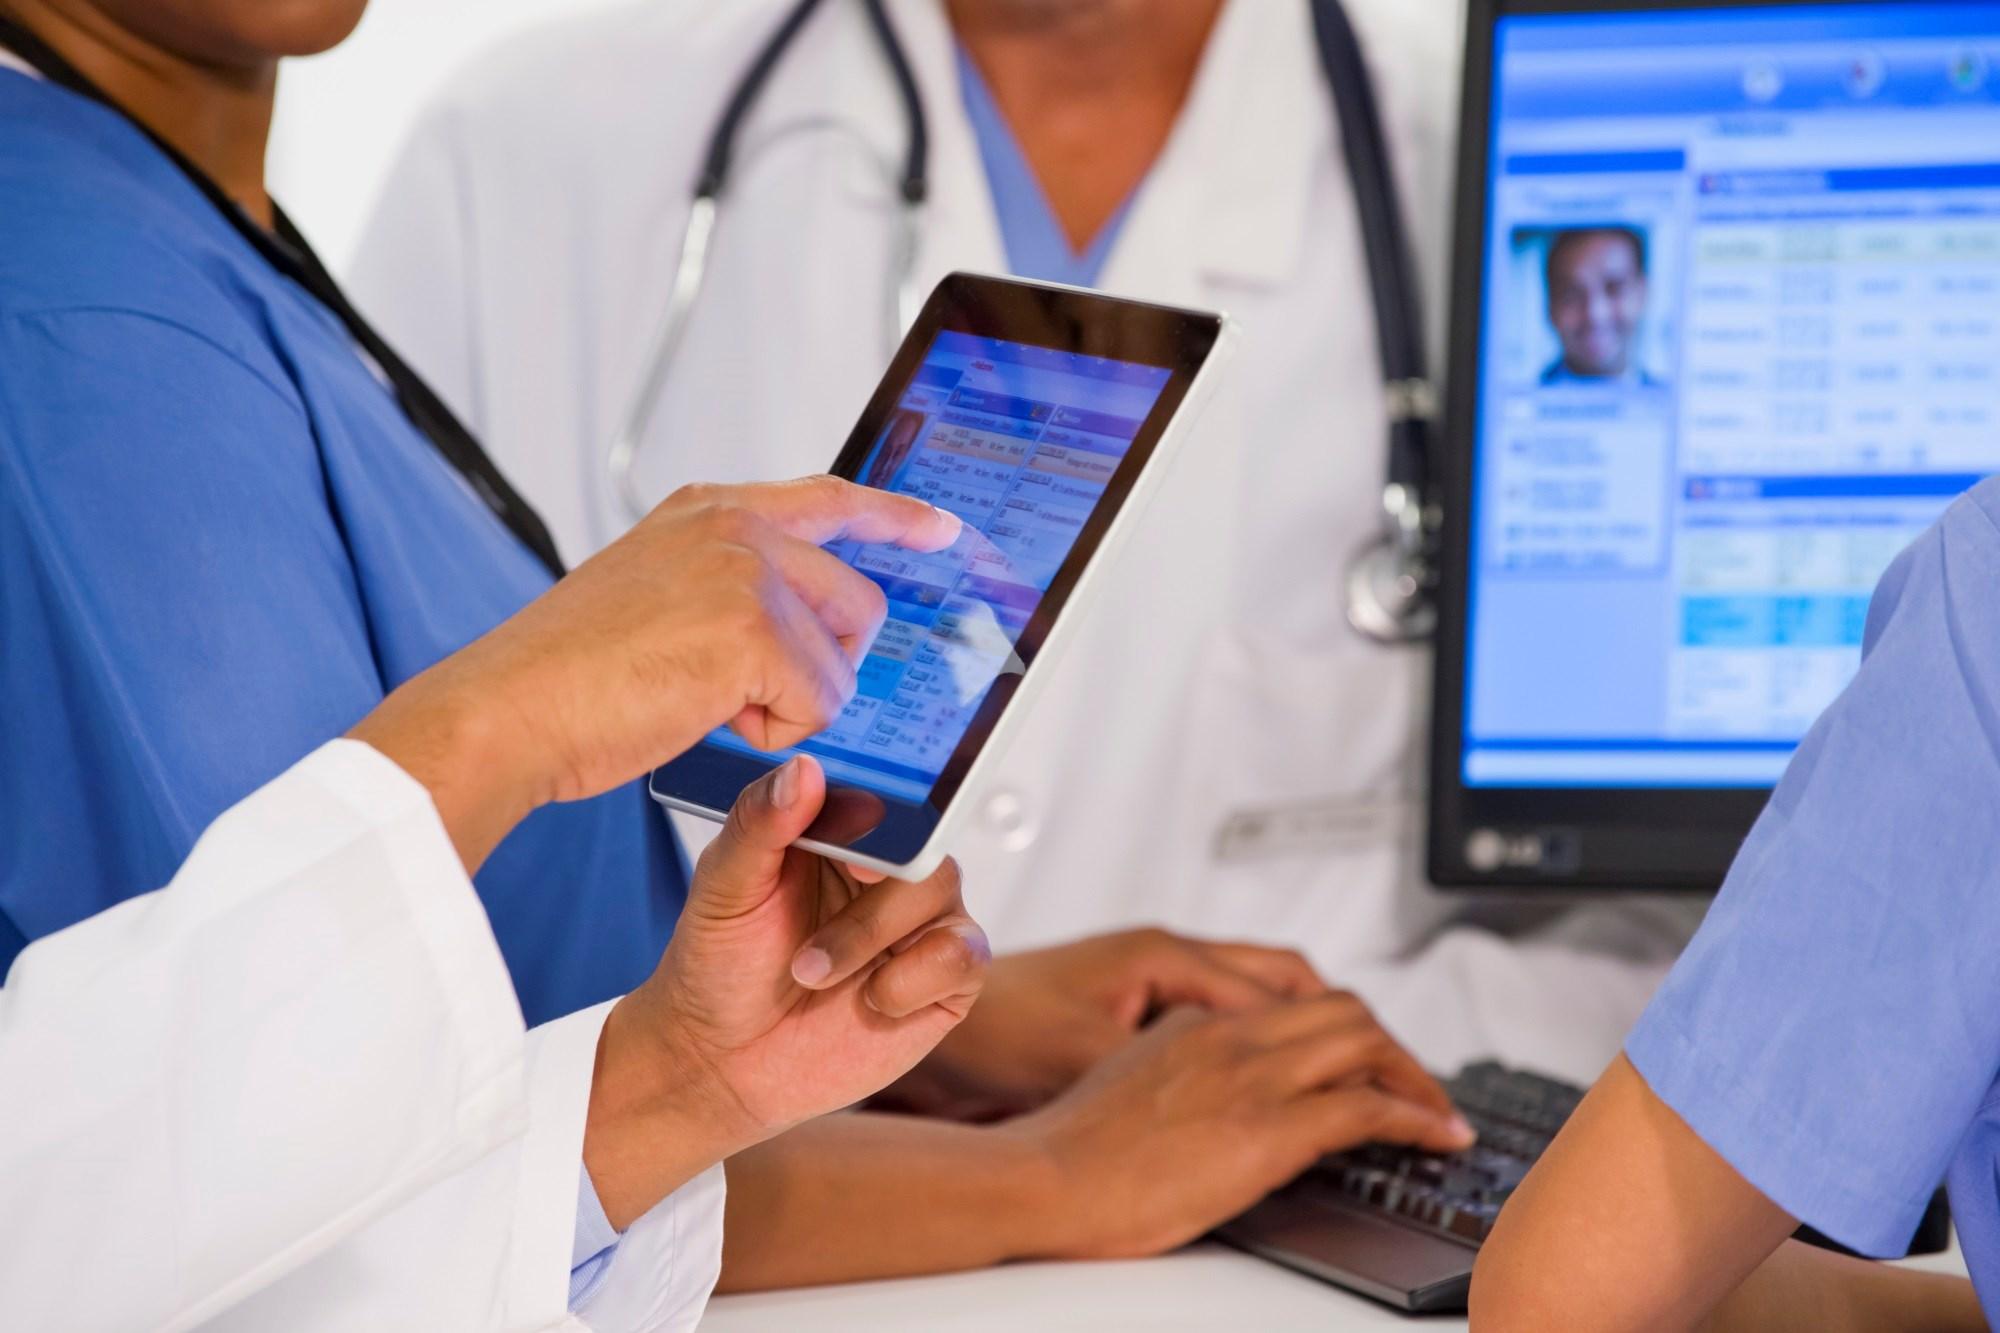 Delabeling Patients as Beta-Lactam Allergic Requires Record Updates